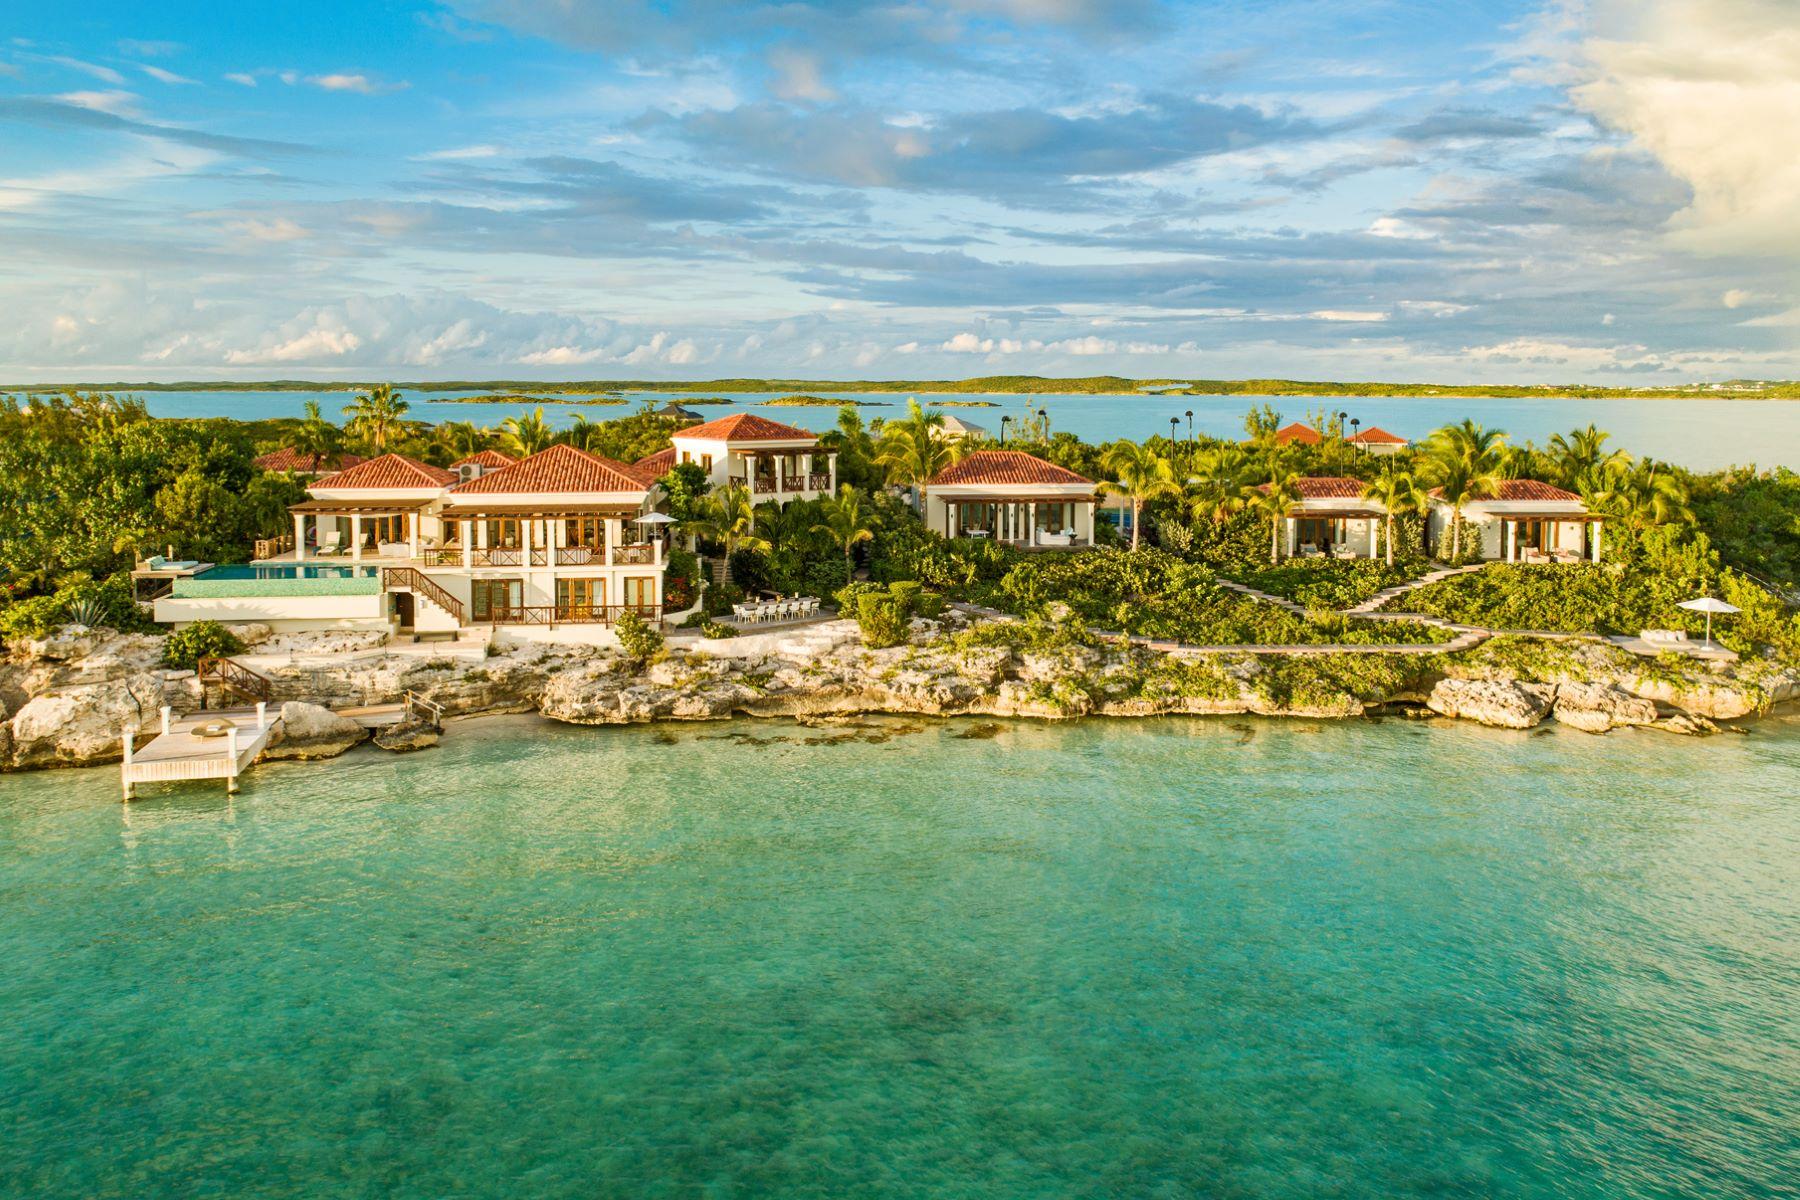 Additional photo for property listing at Dream Big Villa 448 Chalk Sound Drive Sapodilla Bay, Providenciales TCI Turks And Caicos Islands